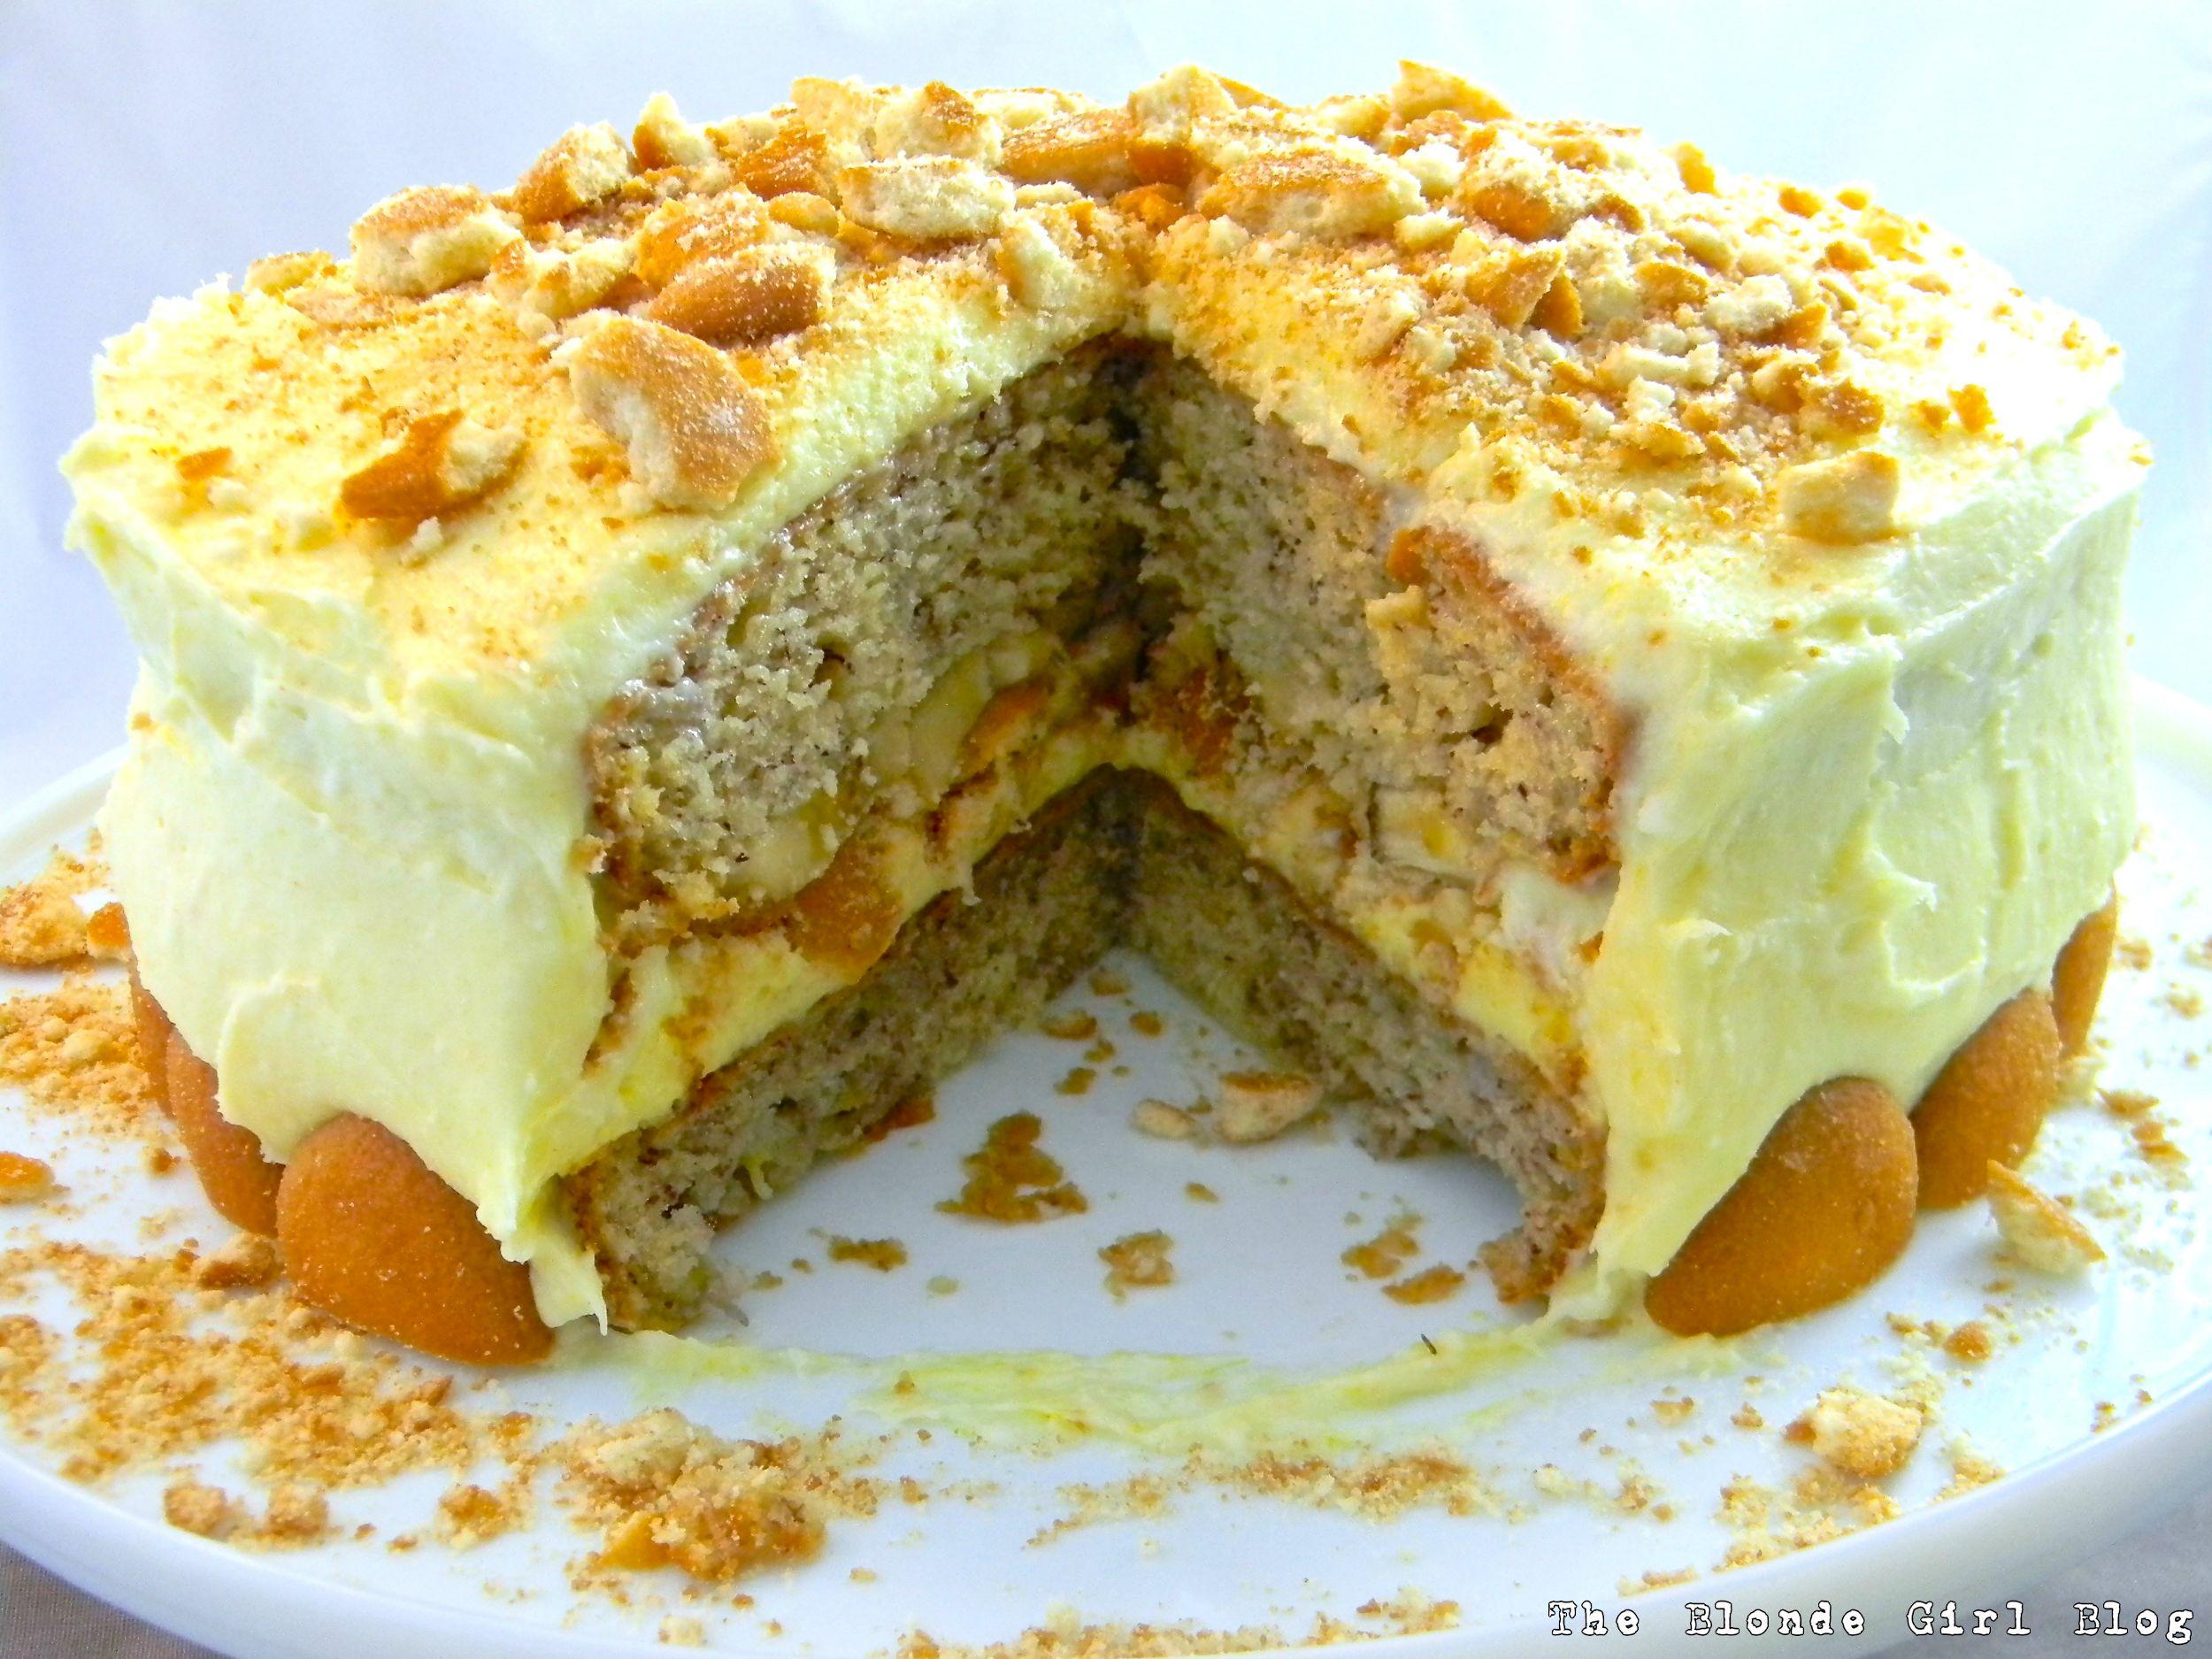 Banana Pudding Nilla Wafer Cake! | The Blonde Girl Blog